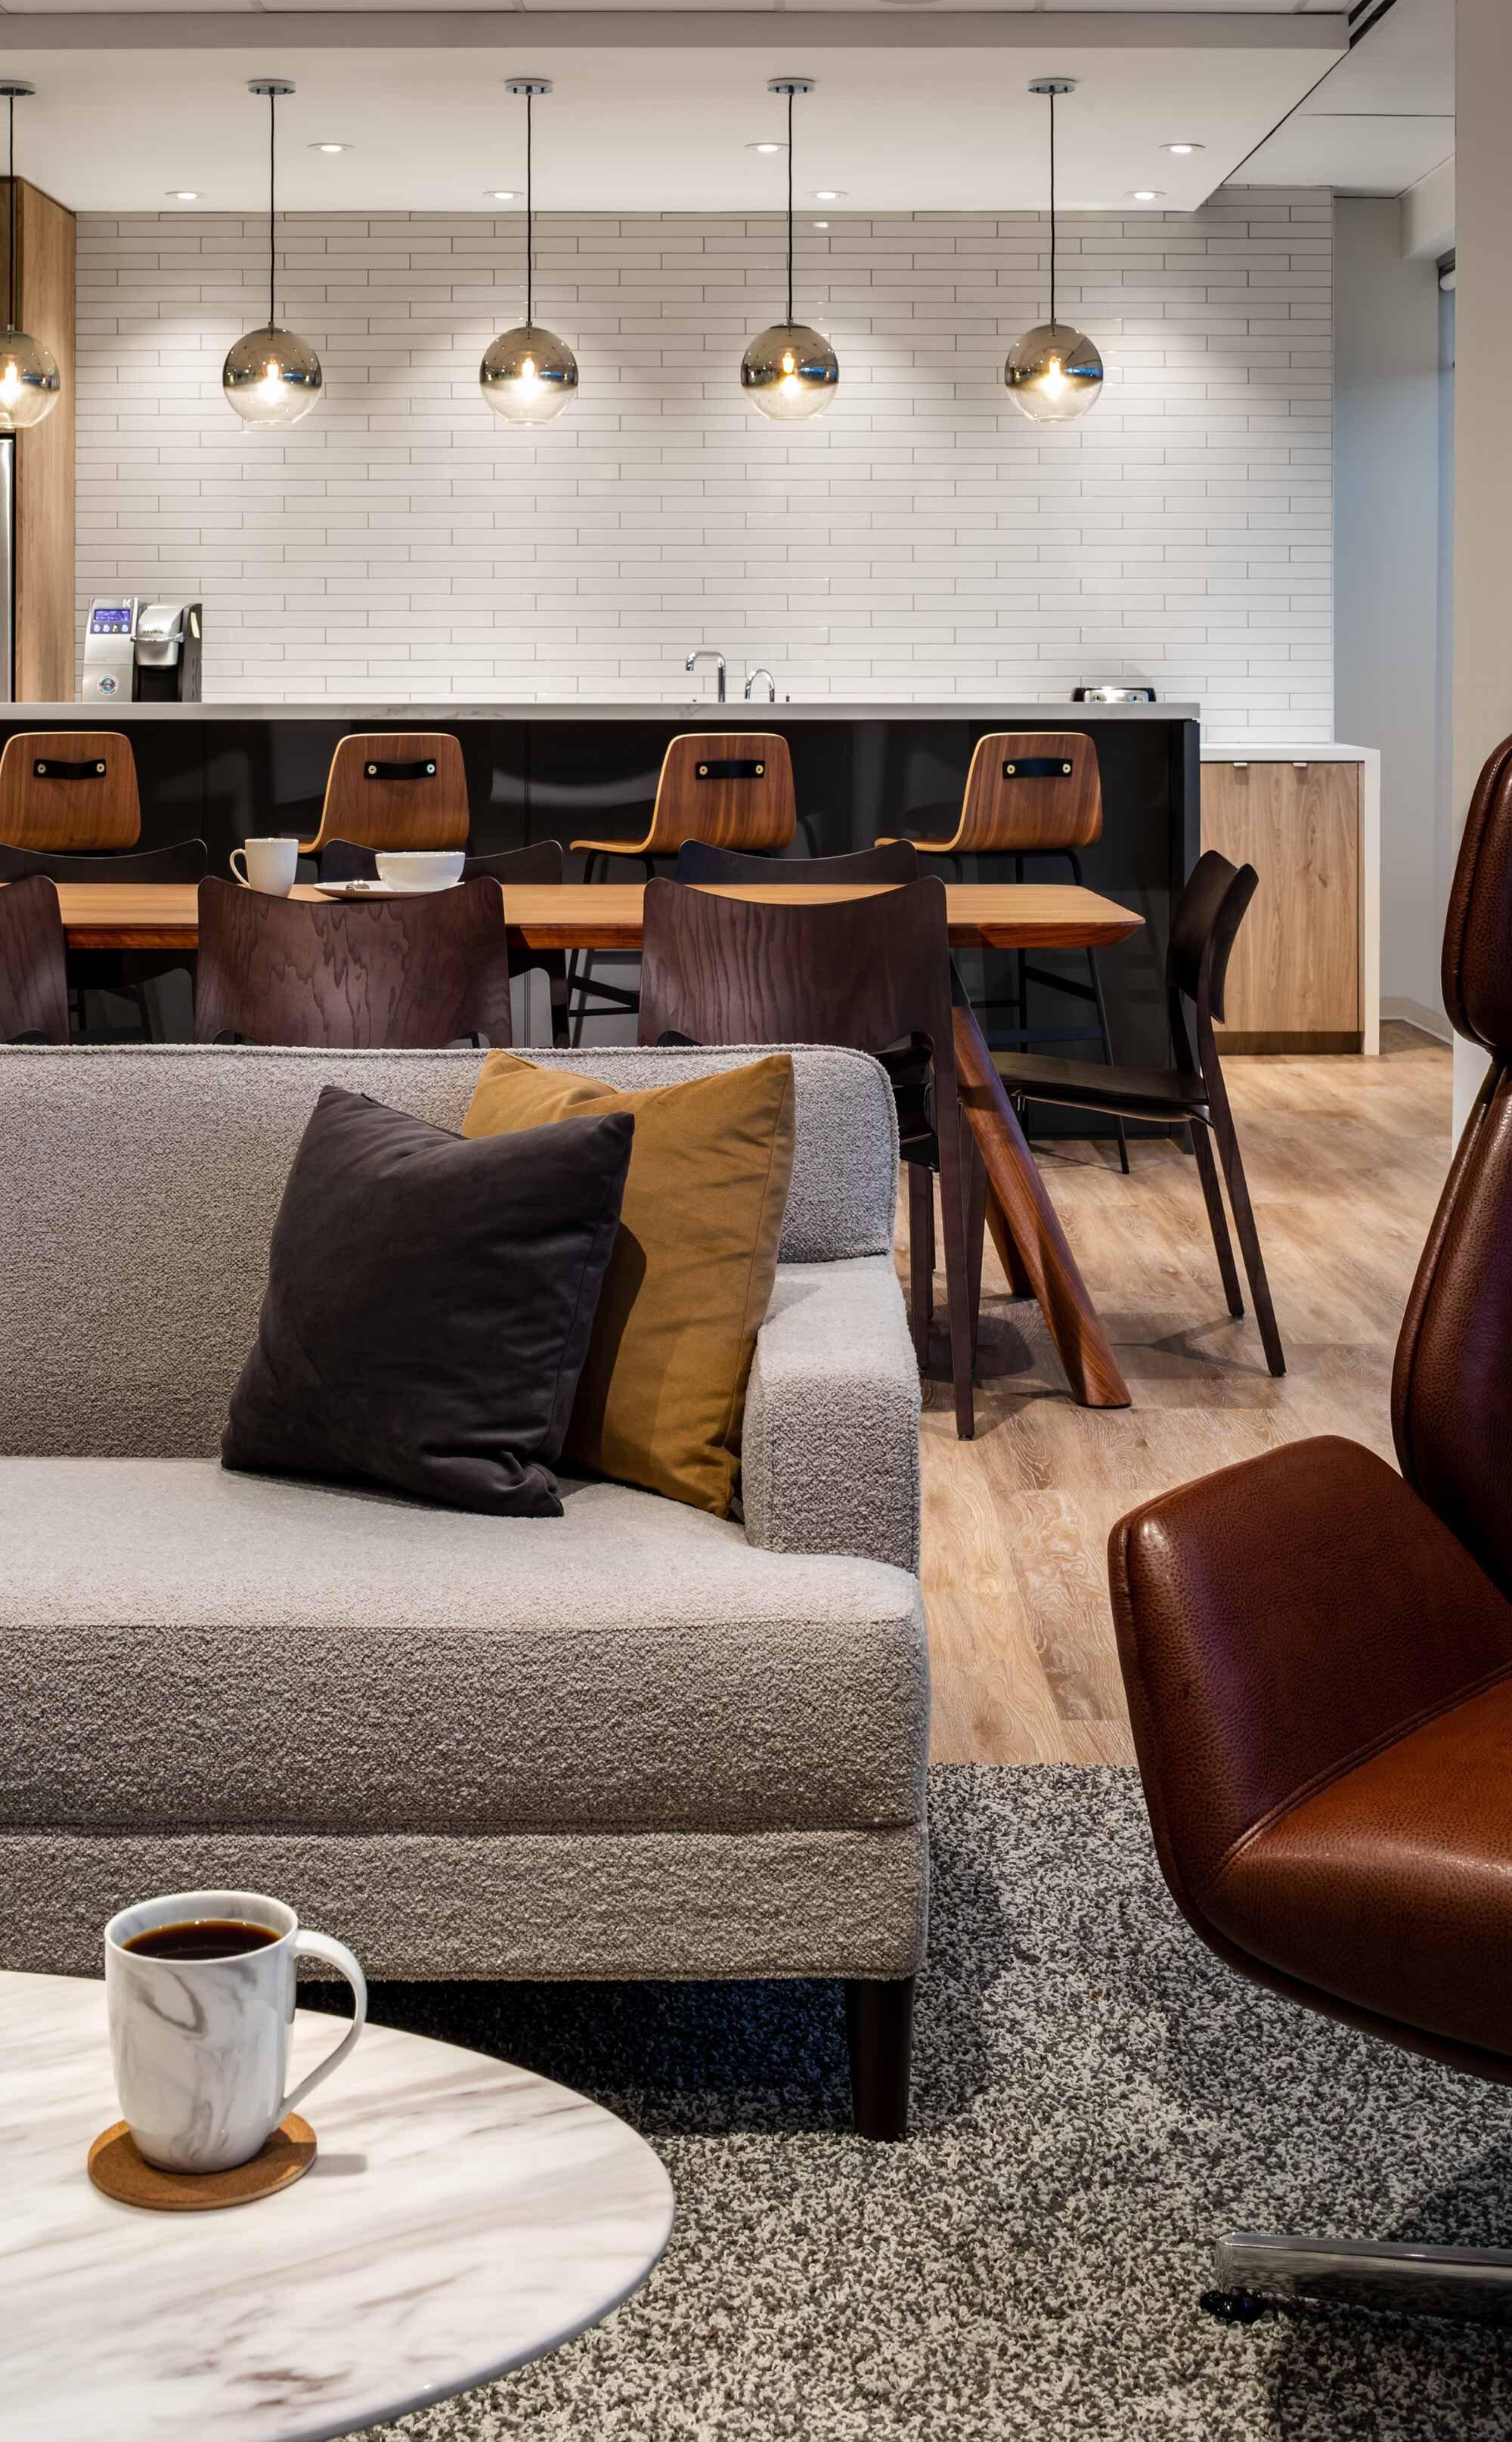 Insurance-services-interior-design-office-calgary-kitchen.jpg